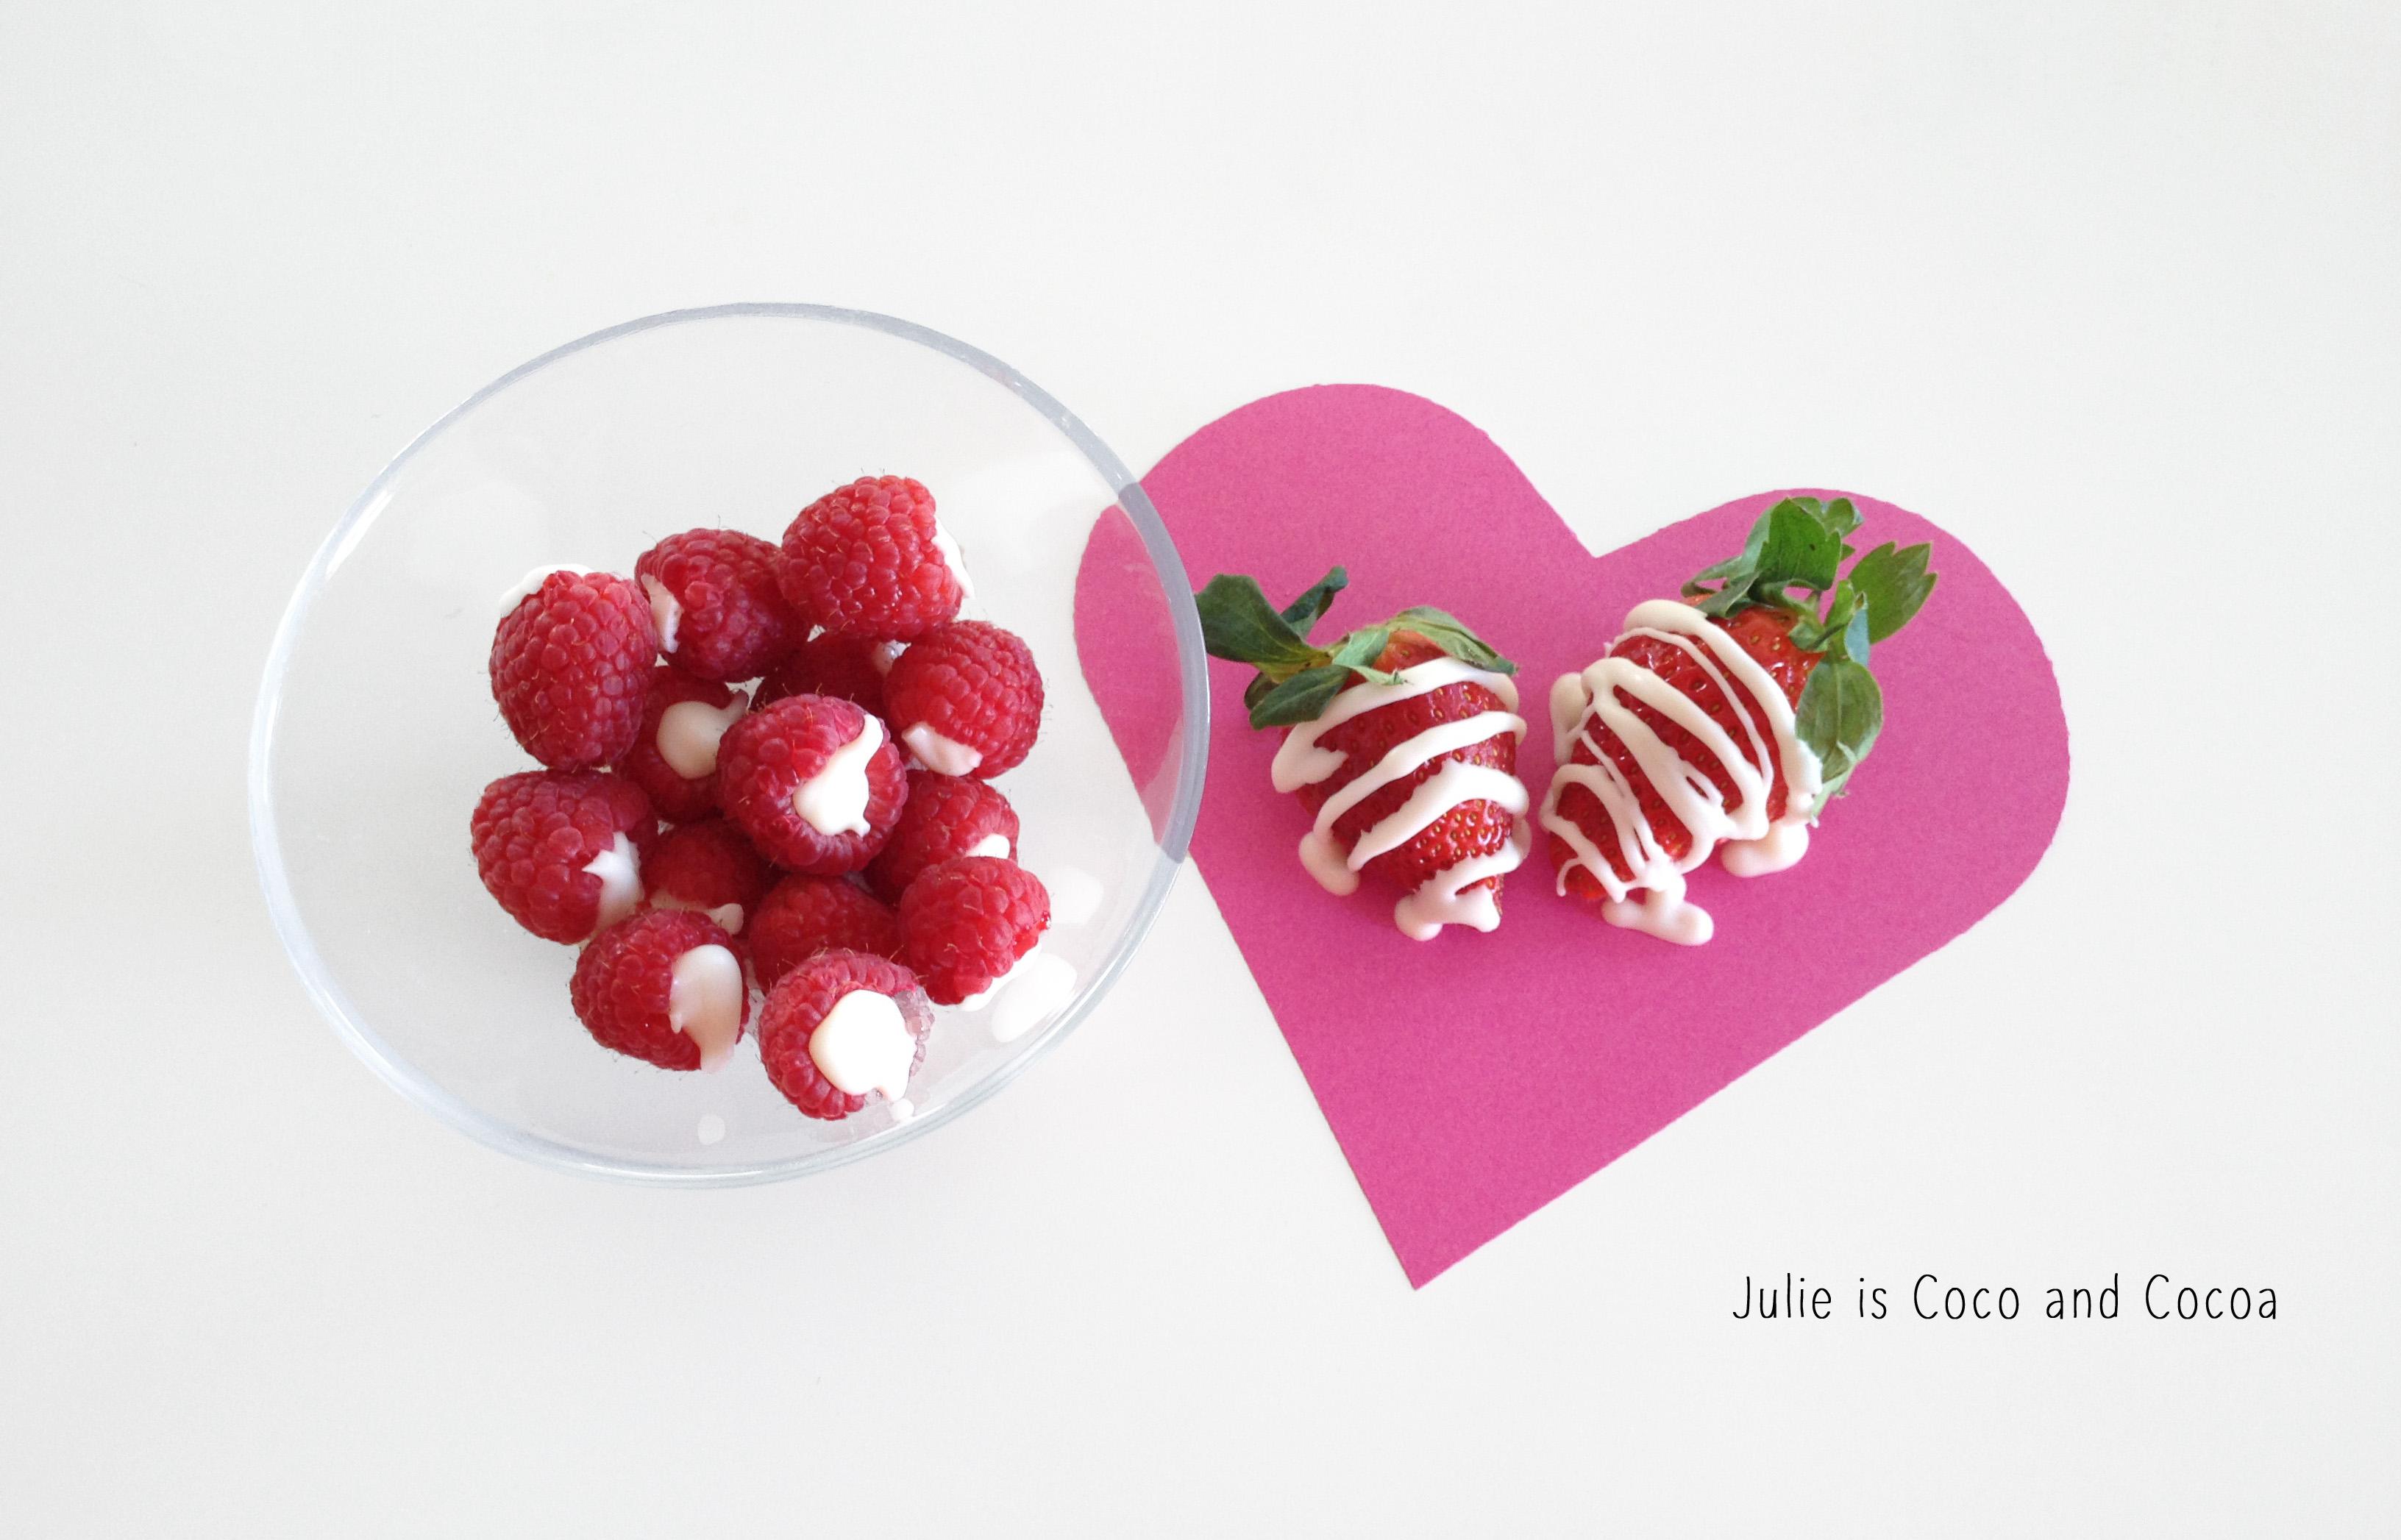 red raspberries and strawberries